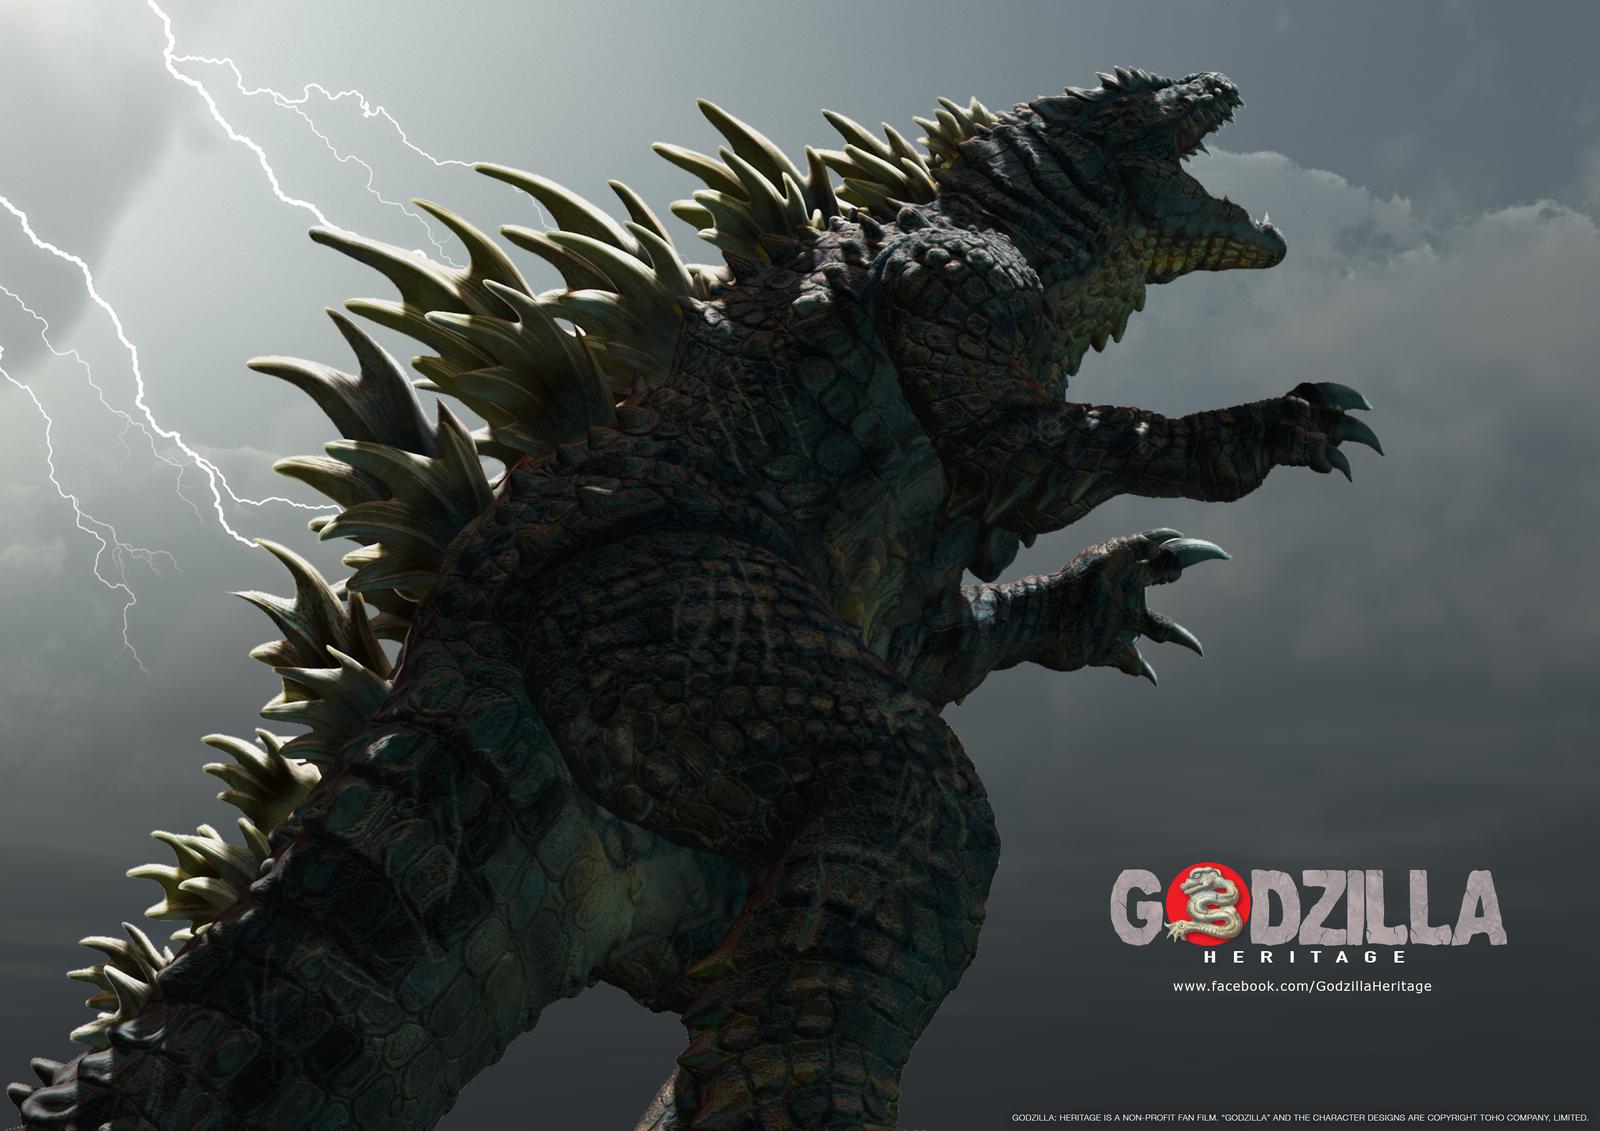 Godzilla: Heritage Concept Art 1 by LDN-RDNT